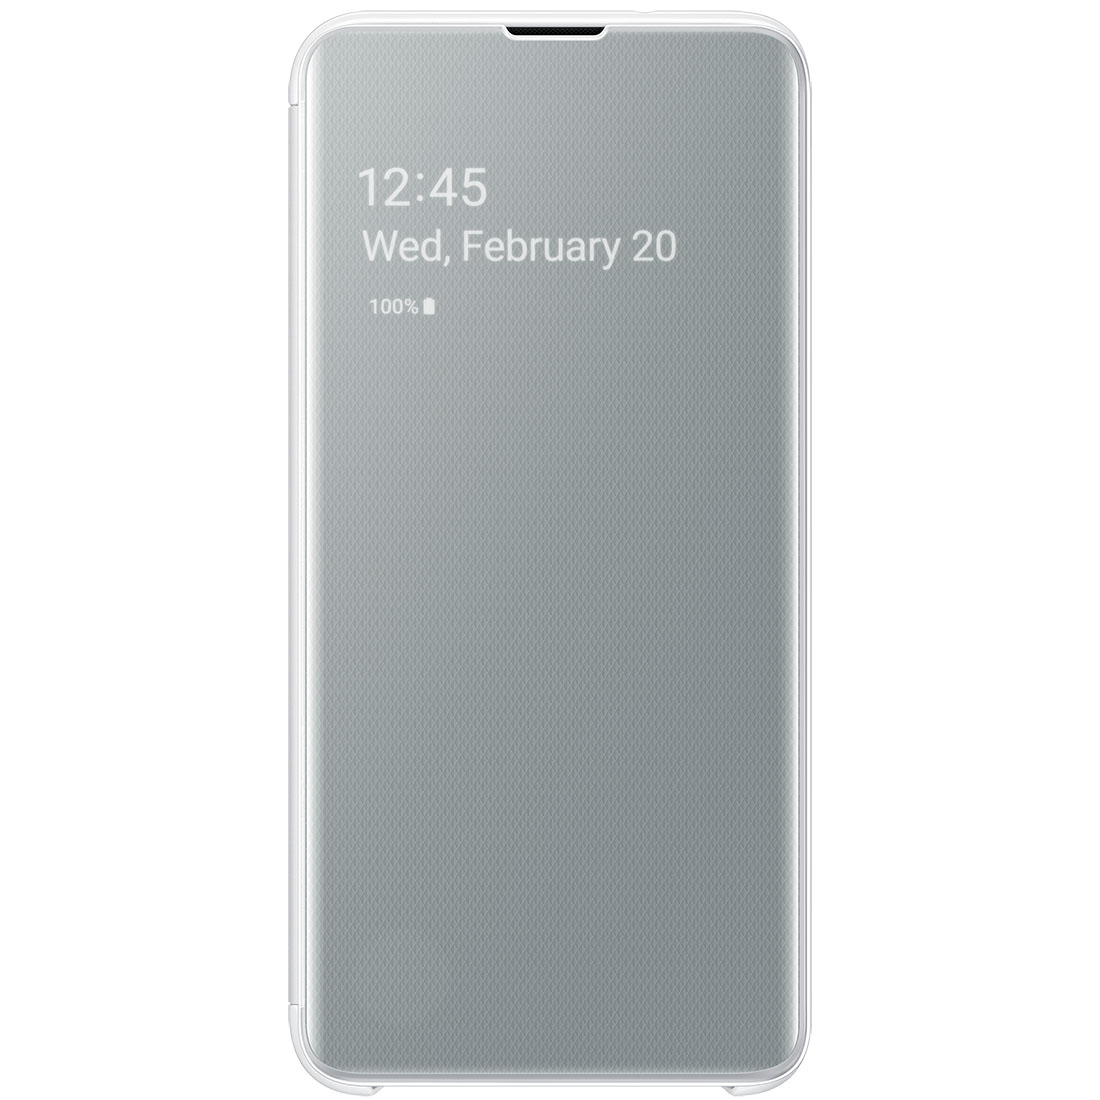 Capa Original Samsung Clear View Galaxy S10e 5.8 Pol SM-G970